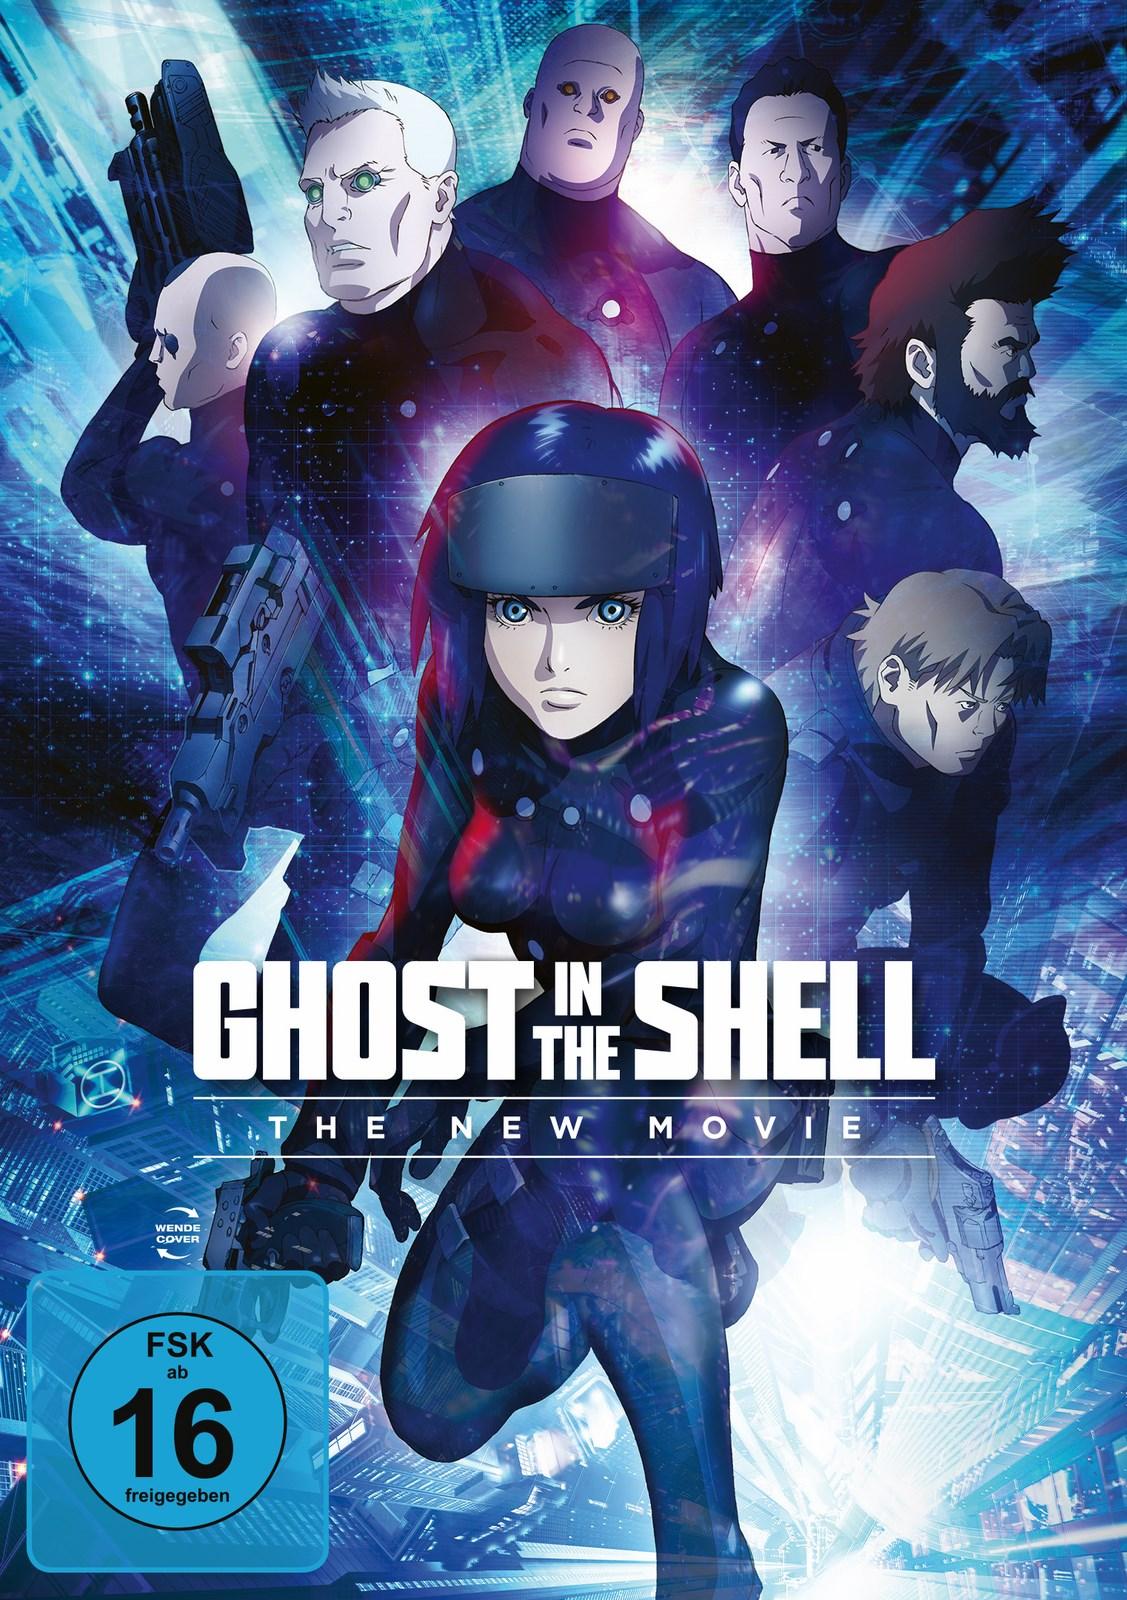 ghost in the shell kino berlin